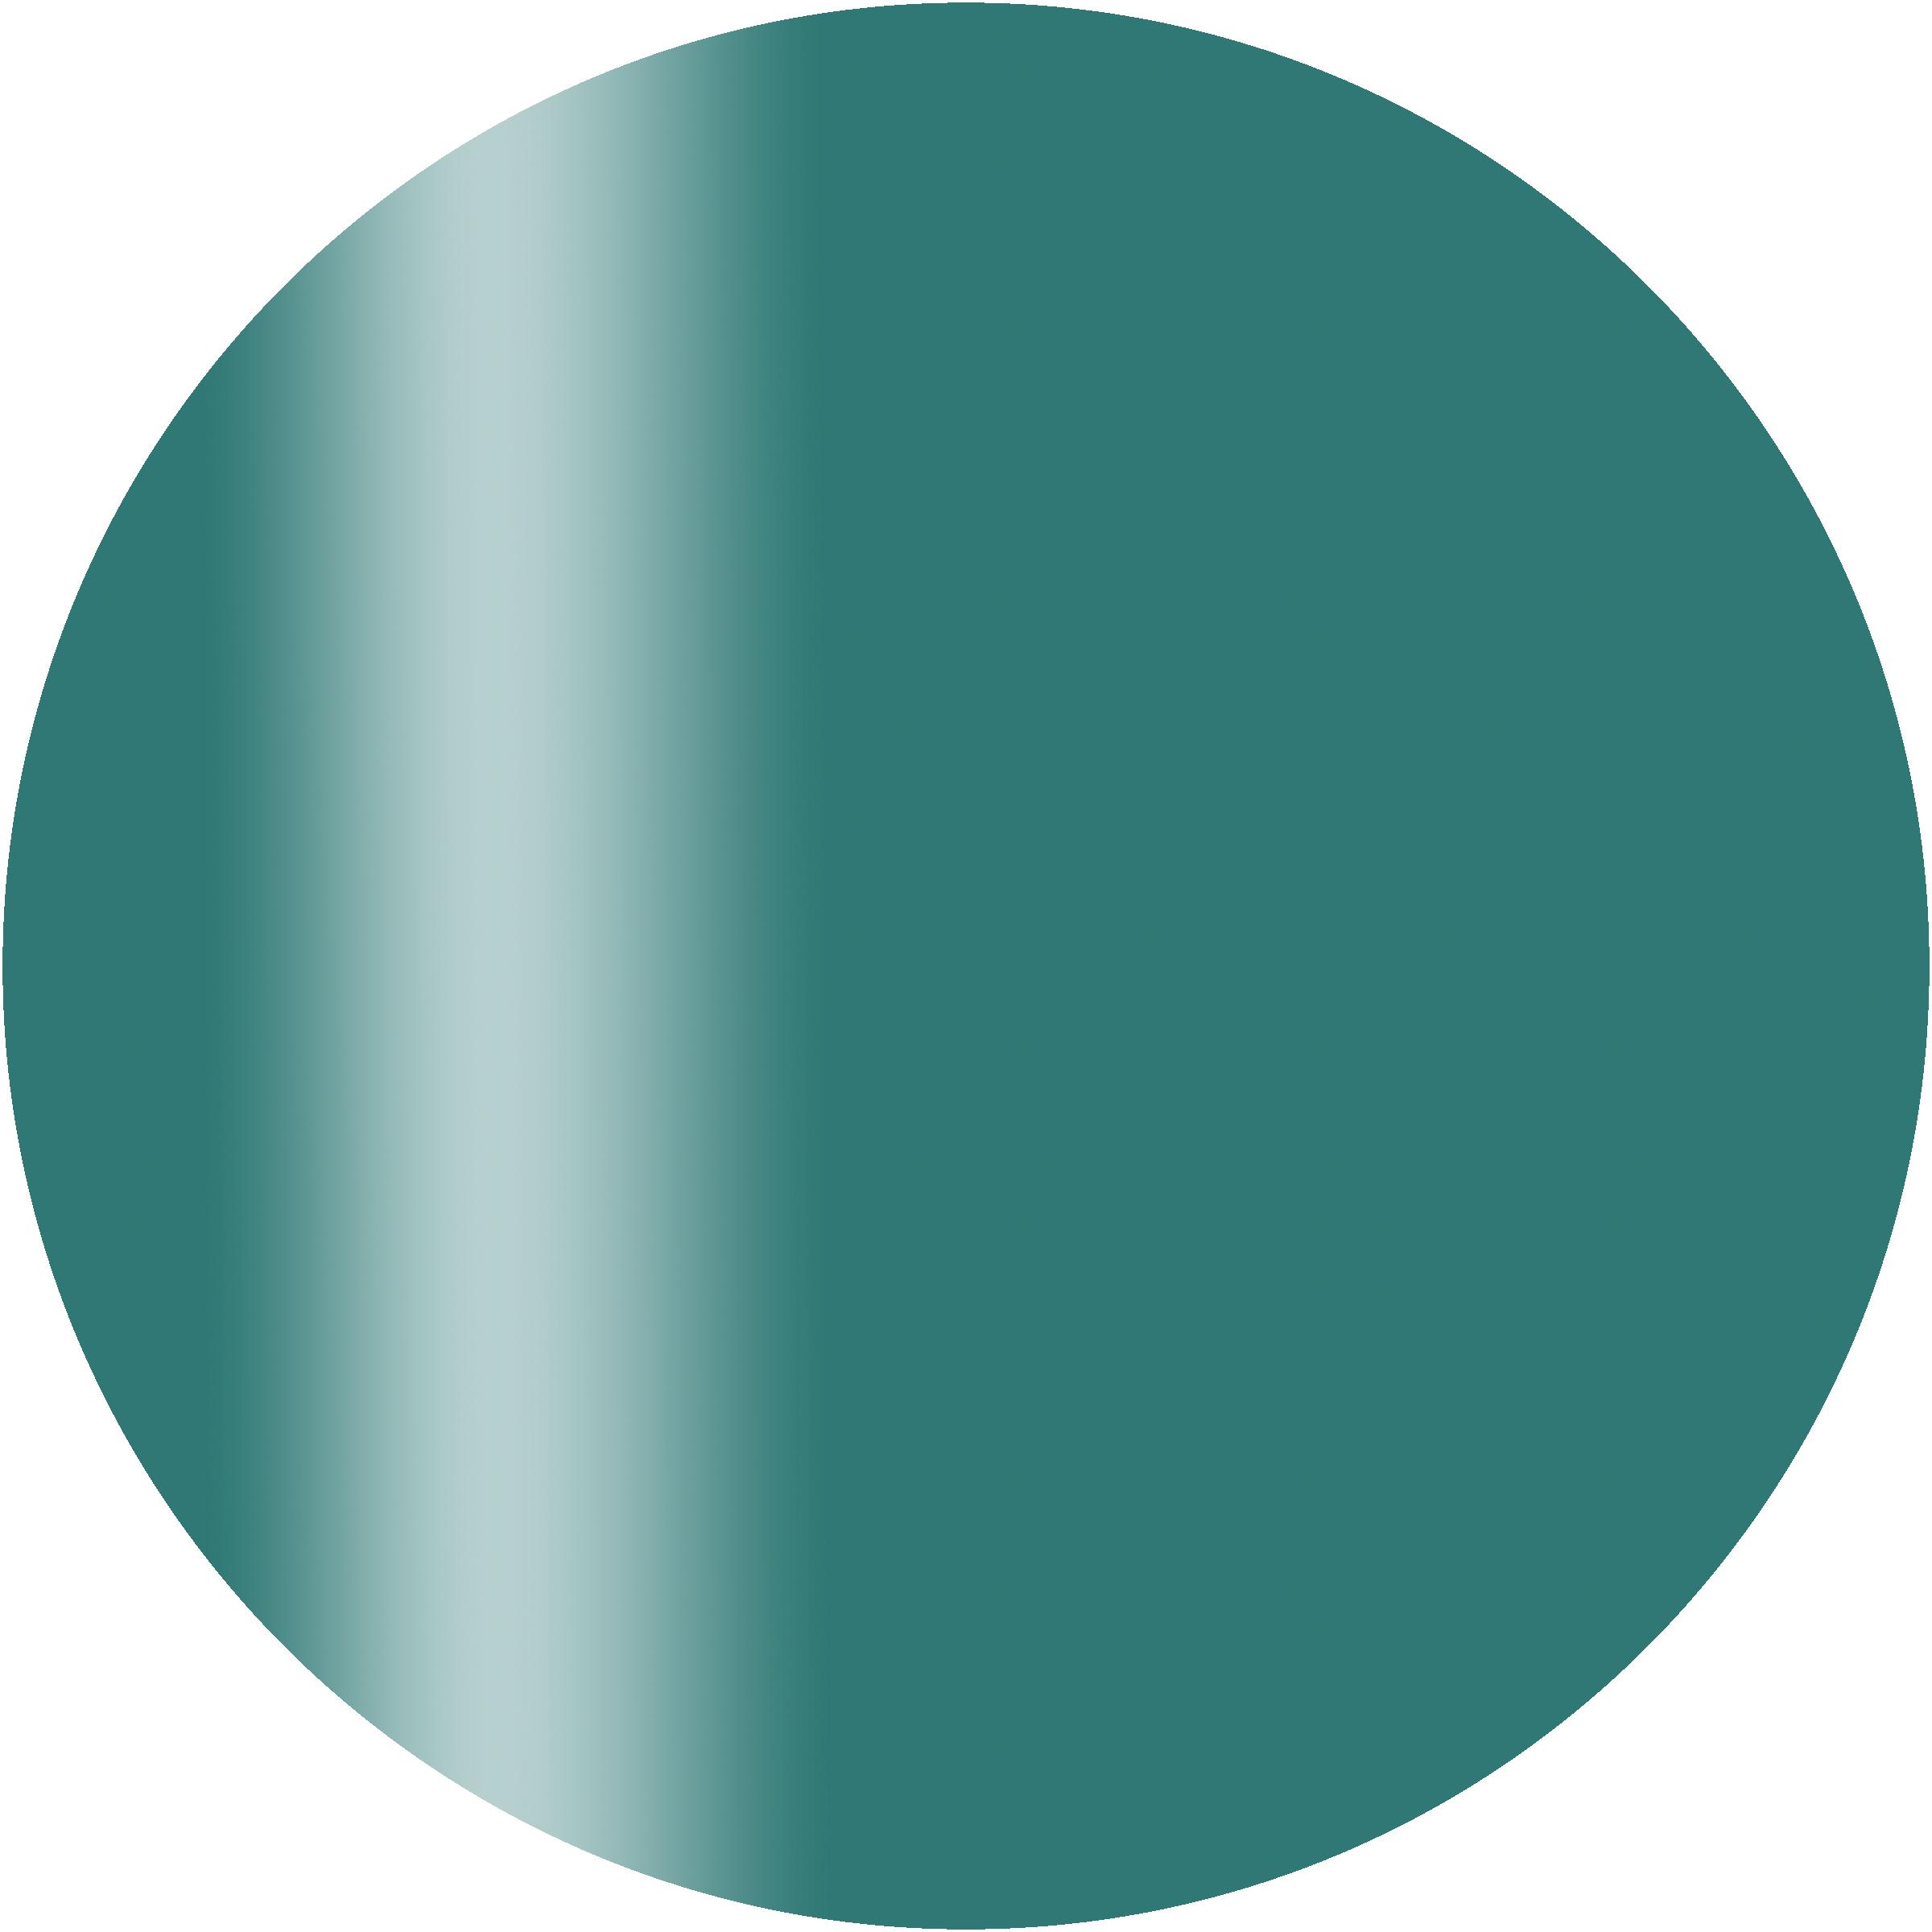 CGS06GR カラーカルジェル プラス ピーコックグリーン 2.5g